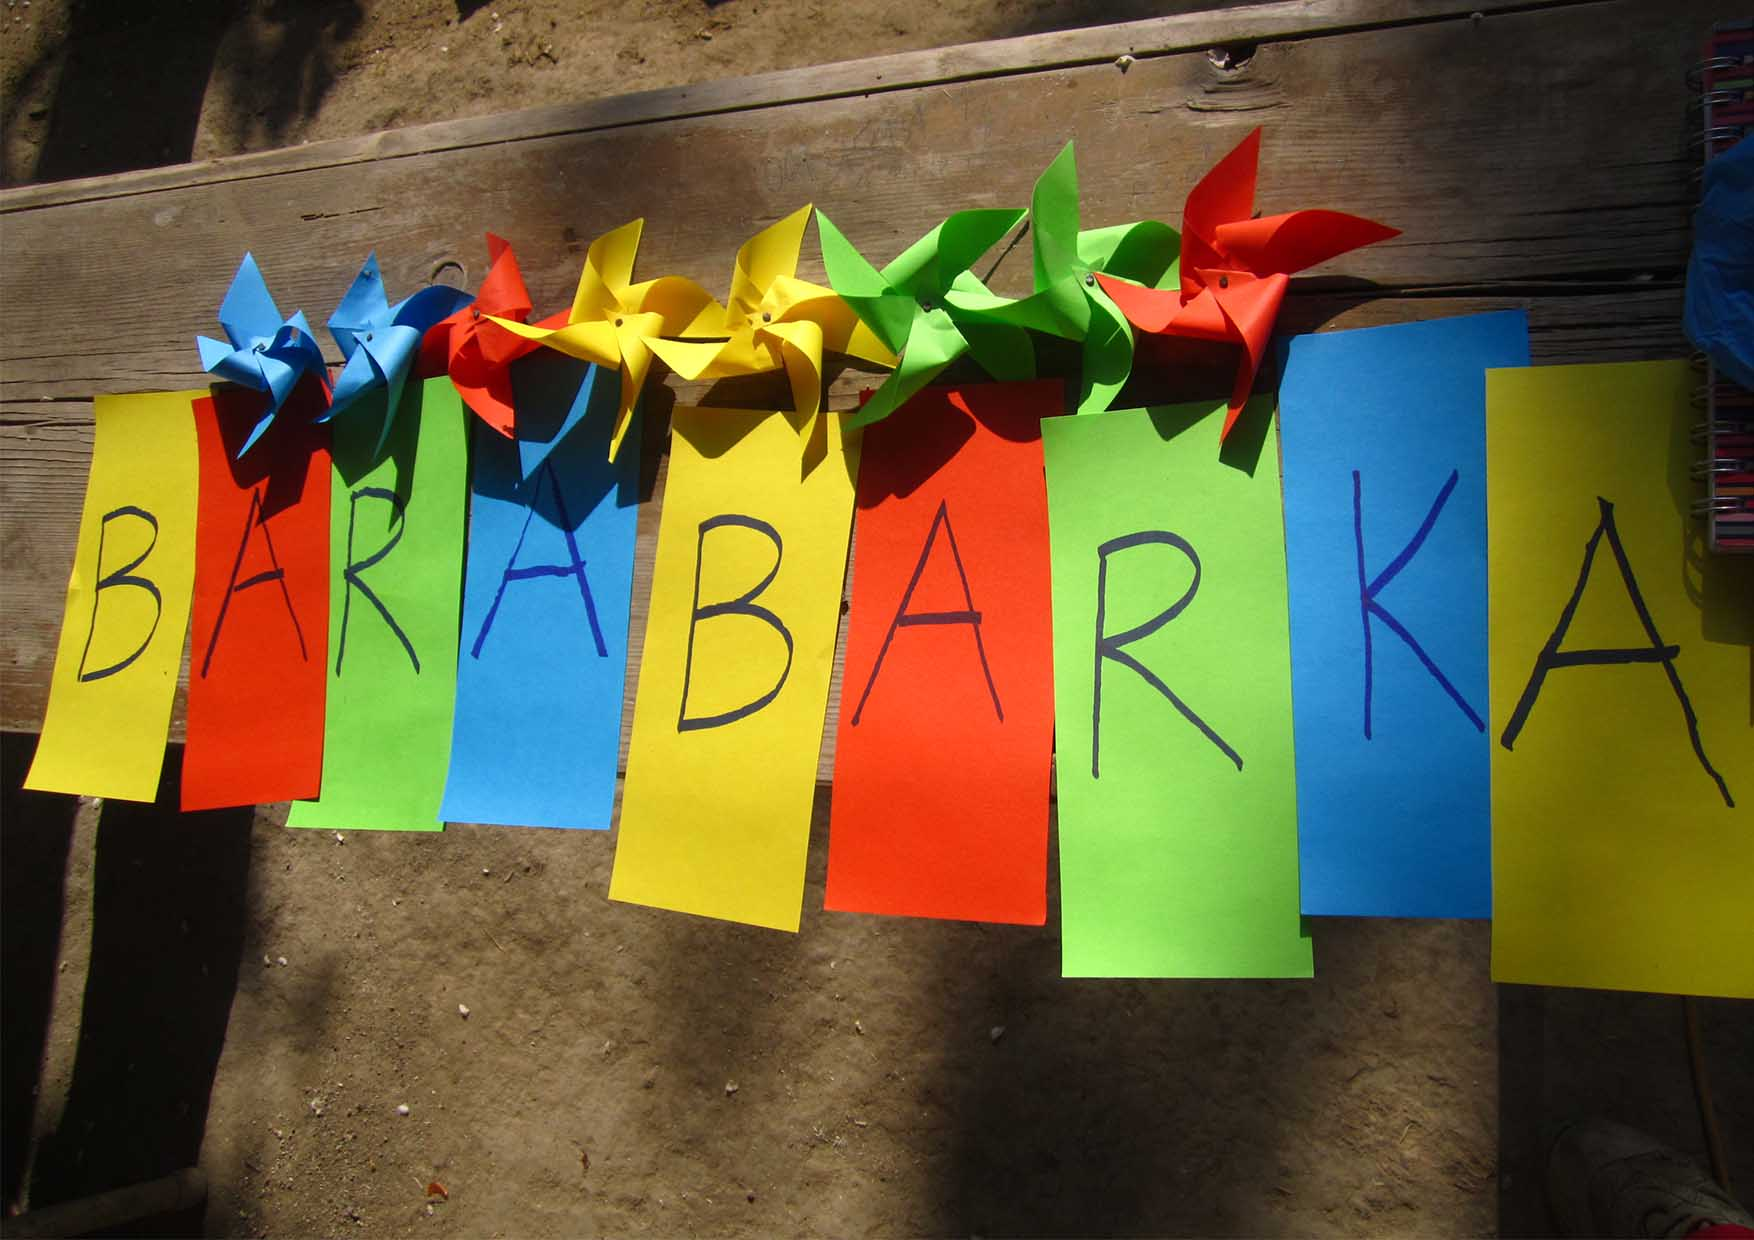 00 Barabarka radionica